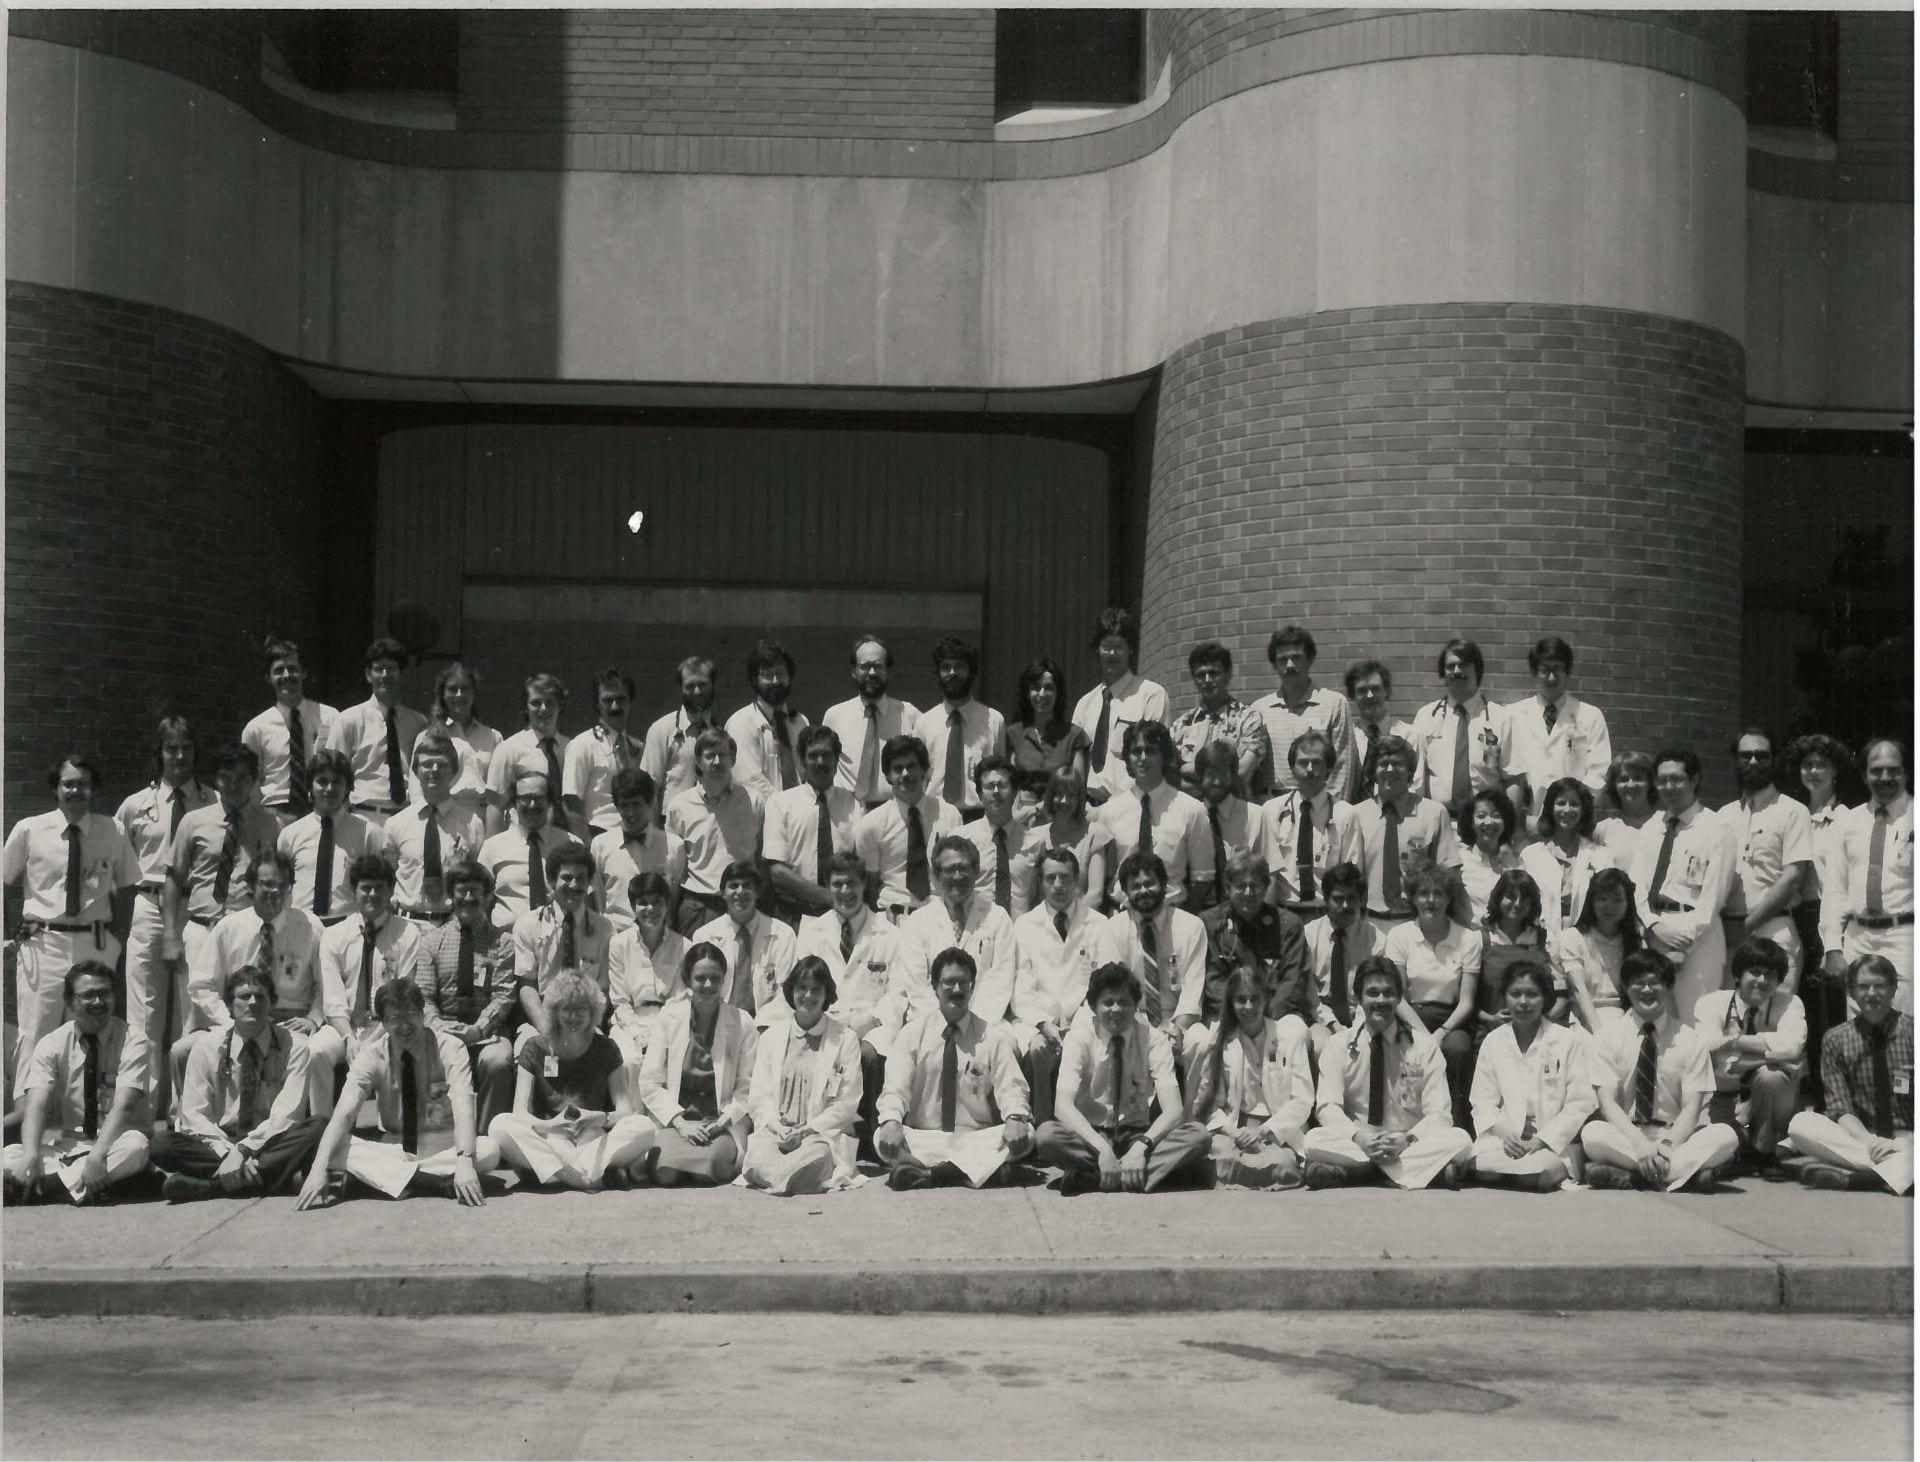 1983 Housestaff Photo